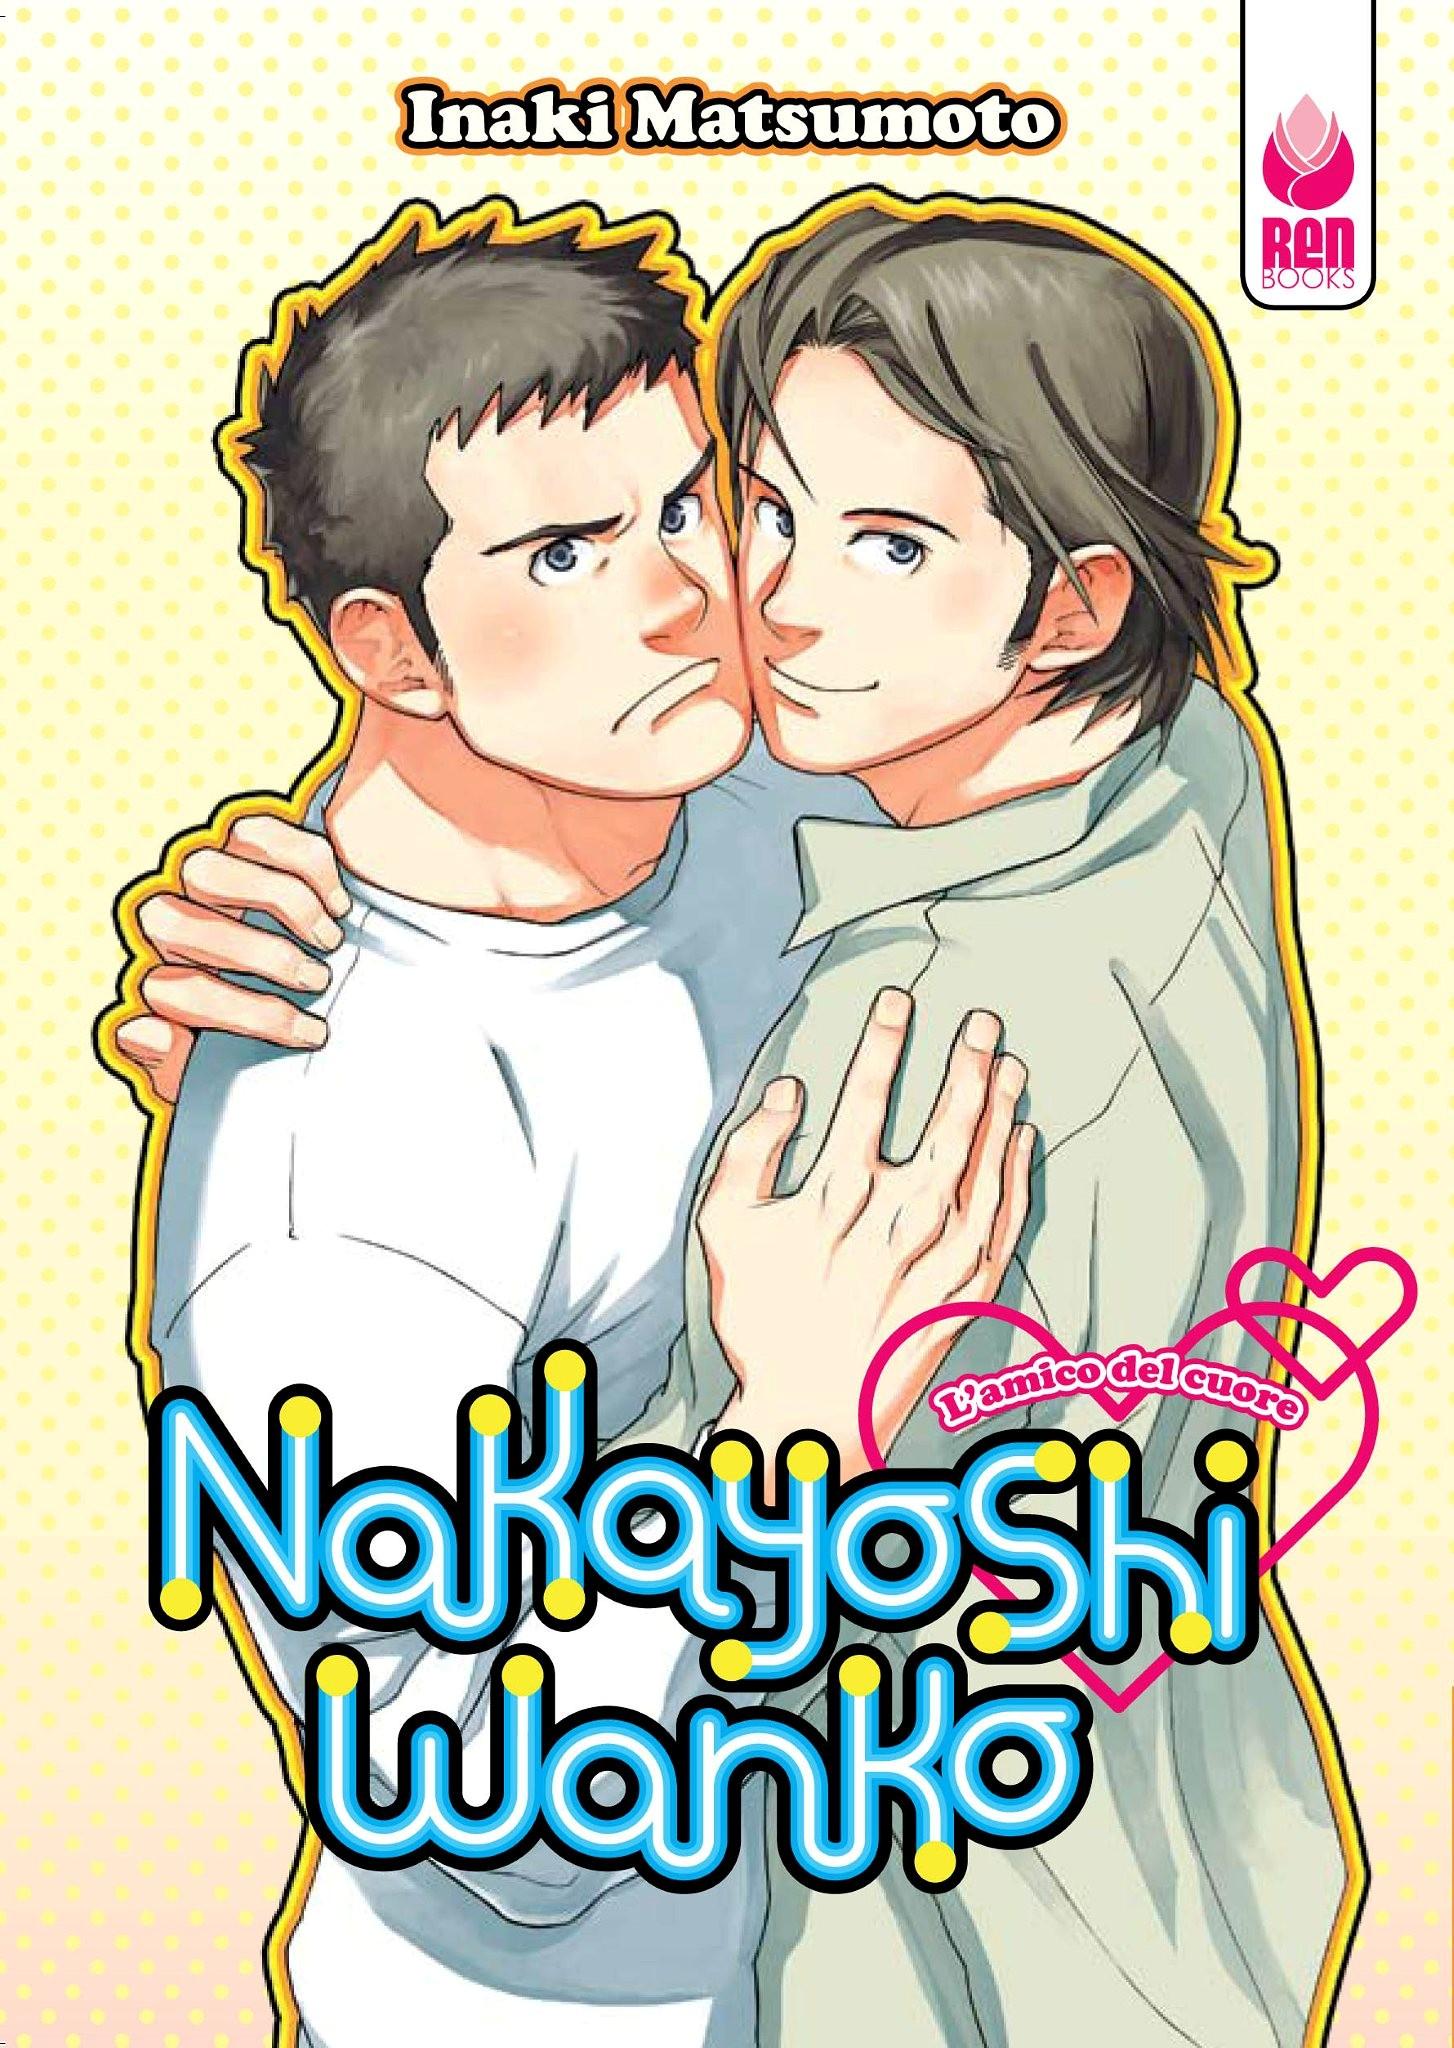 Nakayoshi wanko